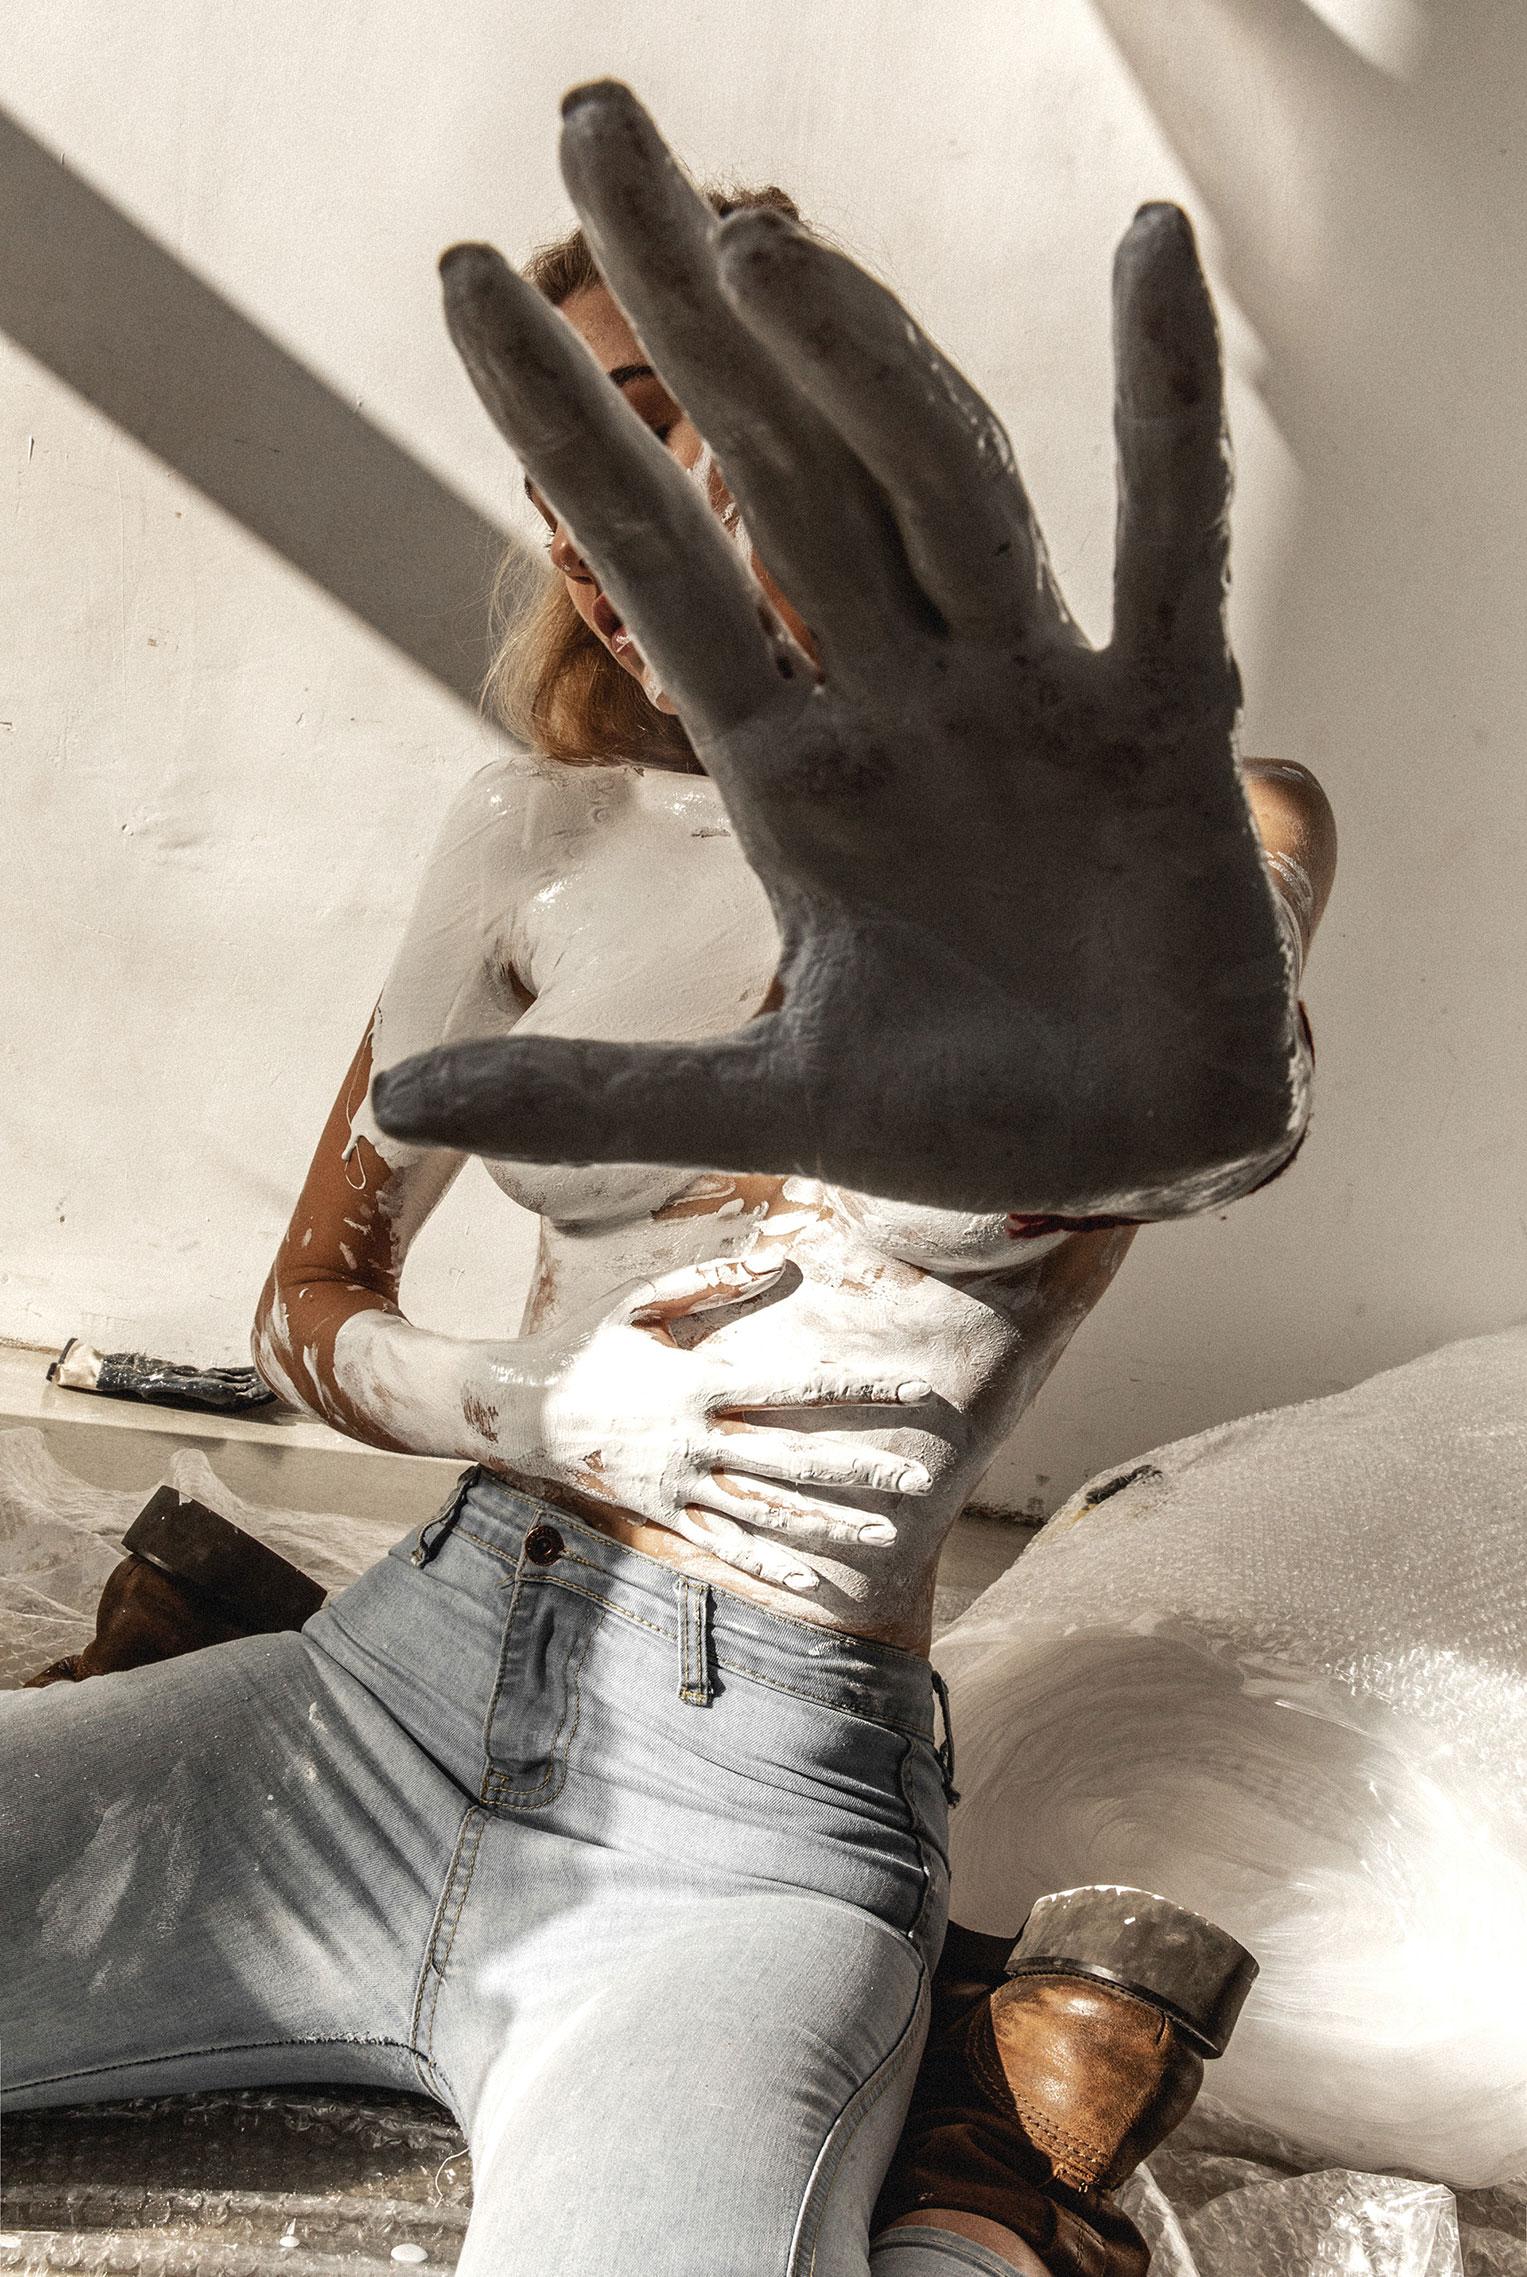 Сексуальная Маша красила стены и заляпалась в краске / фото 02